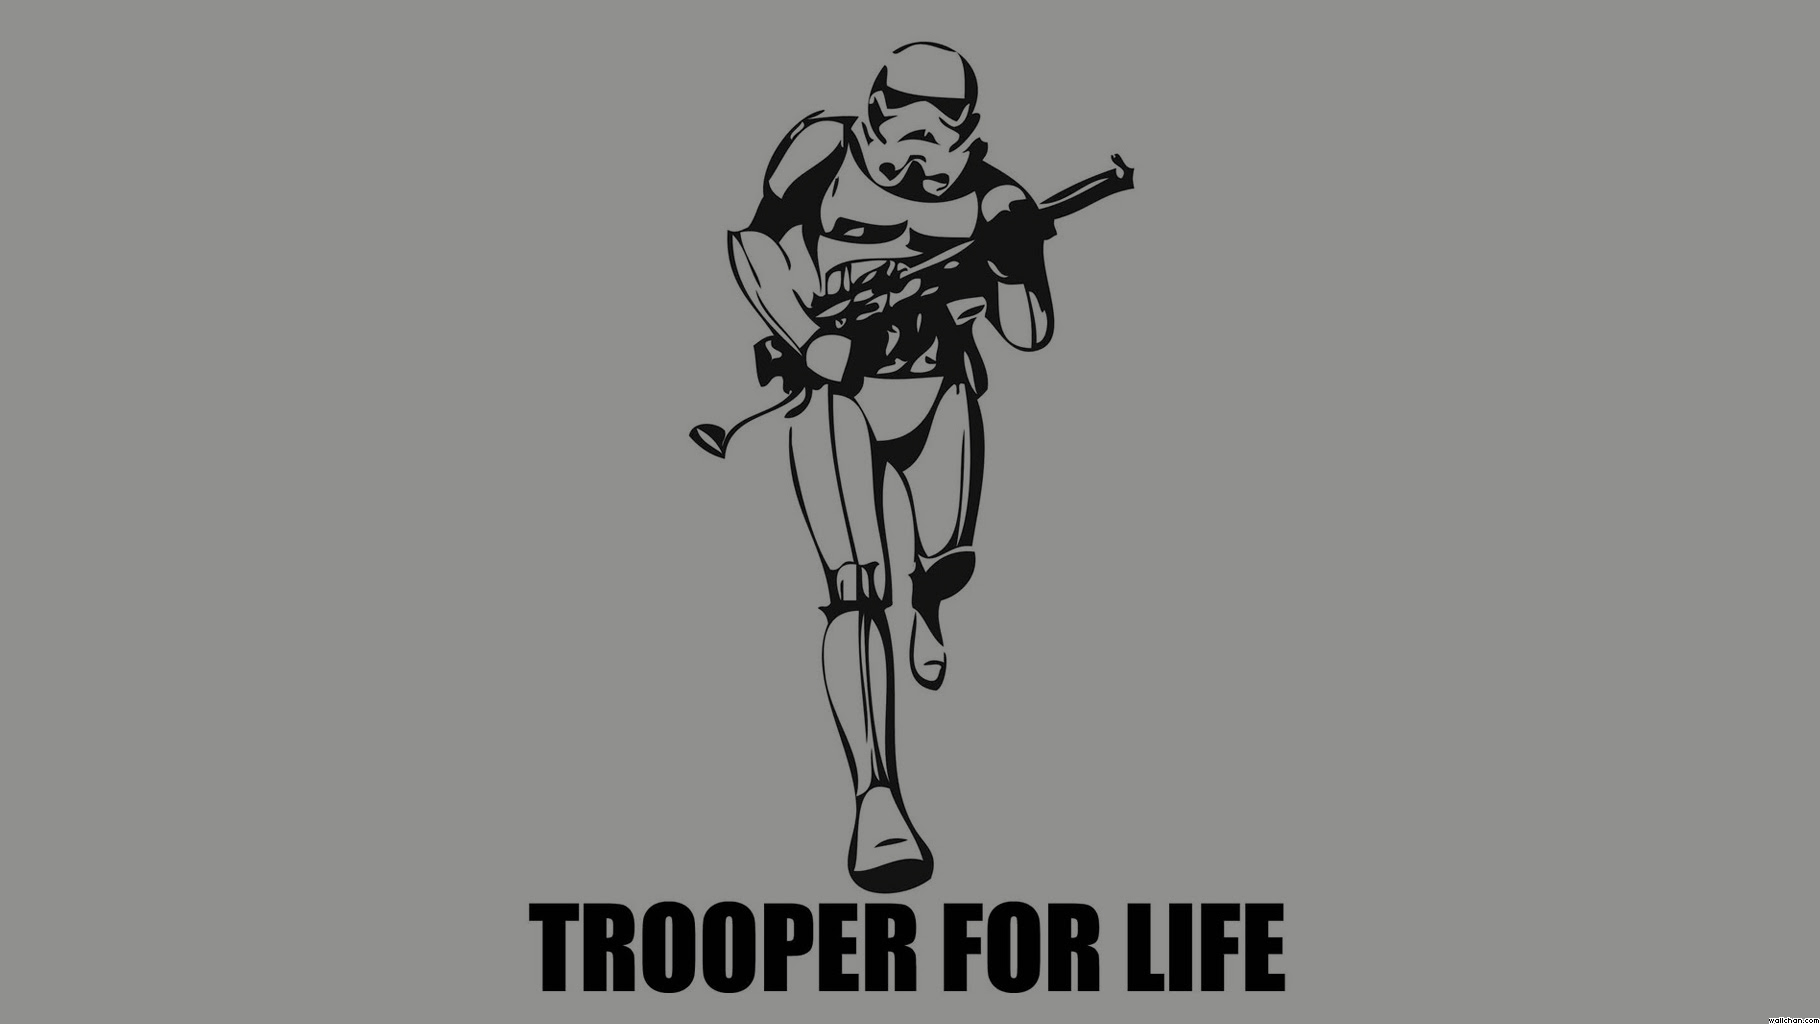 Veryfunnywallpaper Star Wars